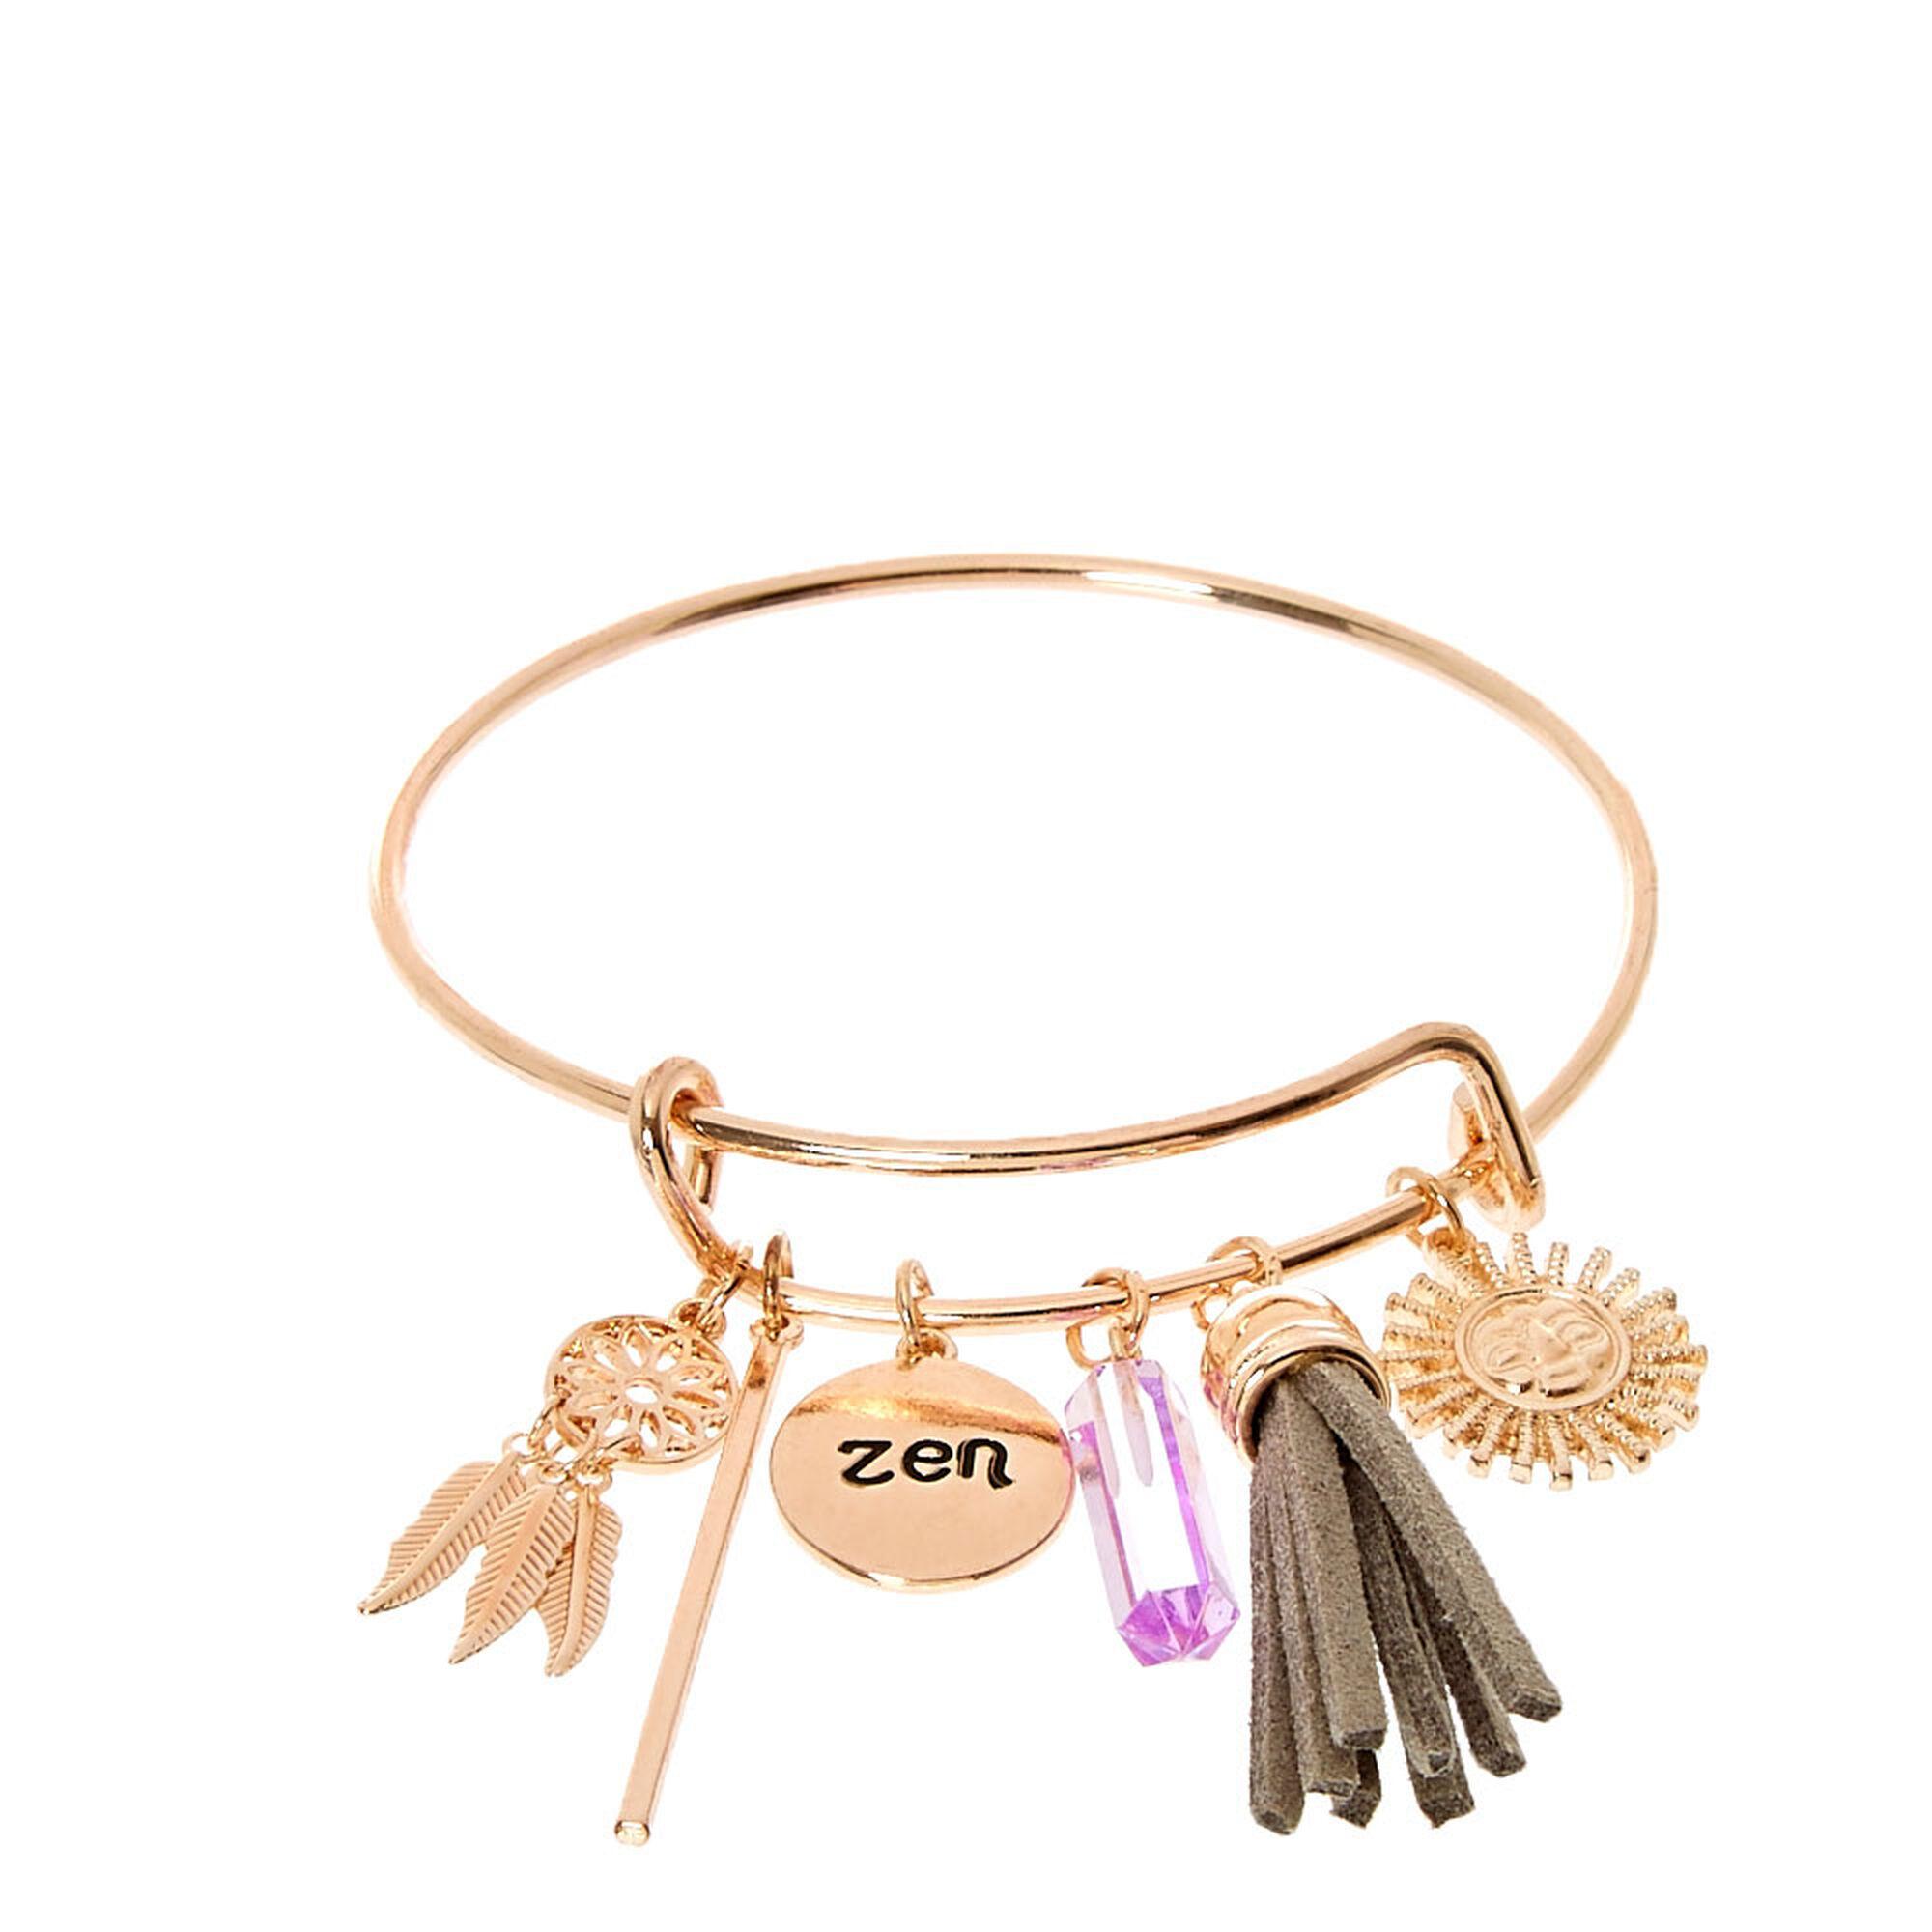 Gold Tone Zen Bangle Charm Bracelet